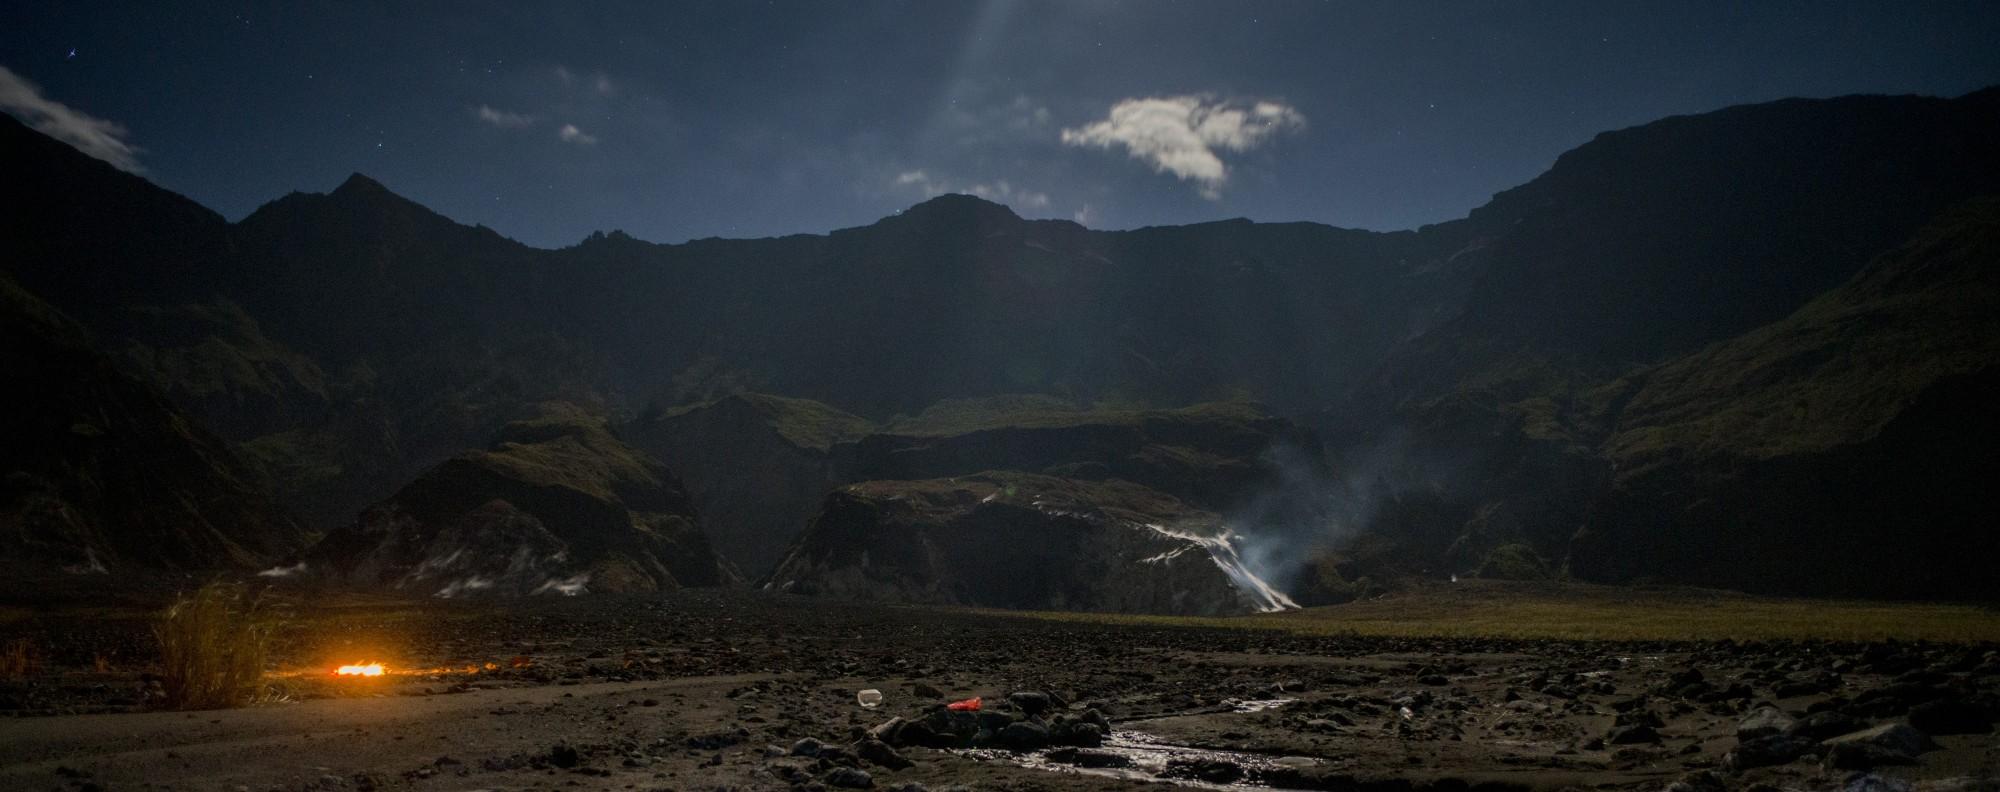 The caldera of Mount Tambora on the Indonesian island of Sumbawa.